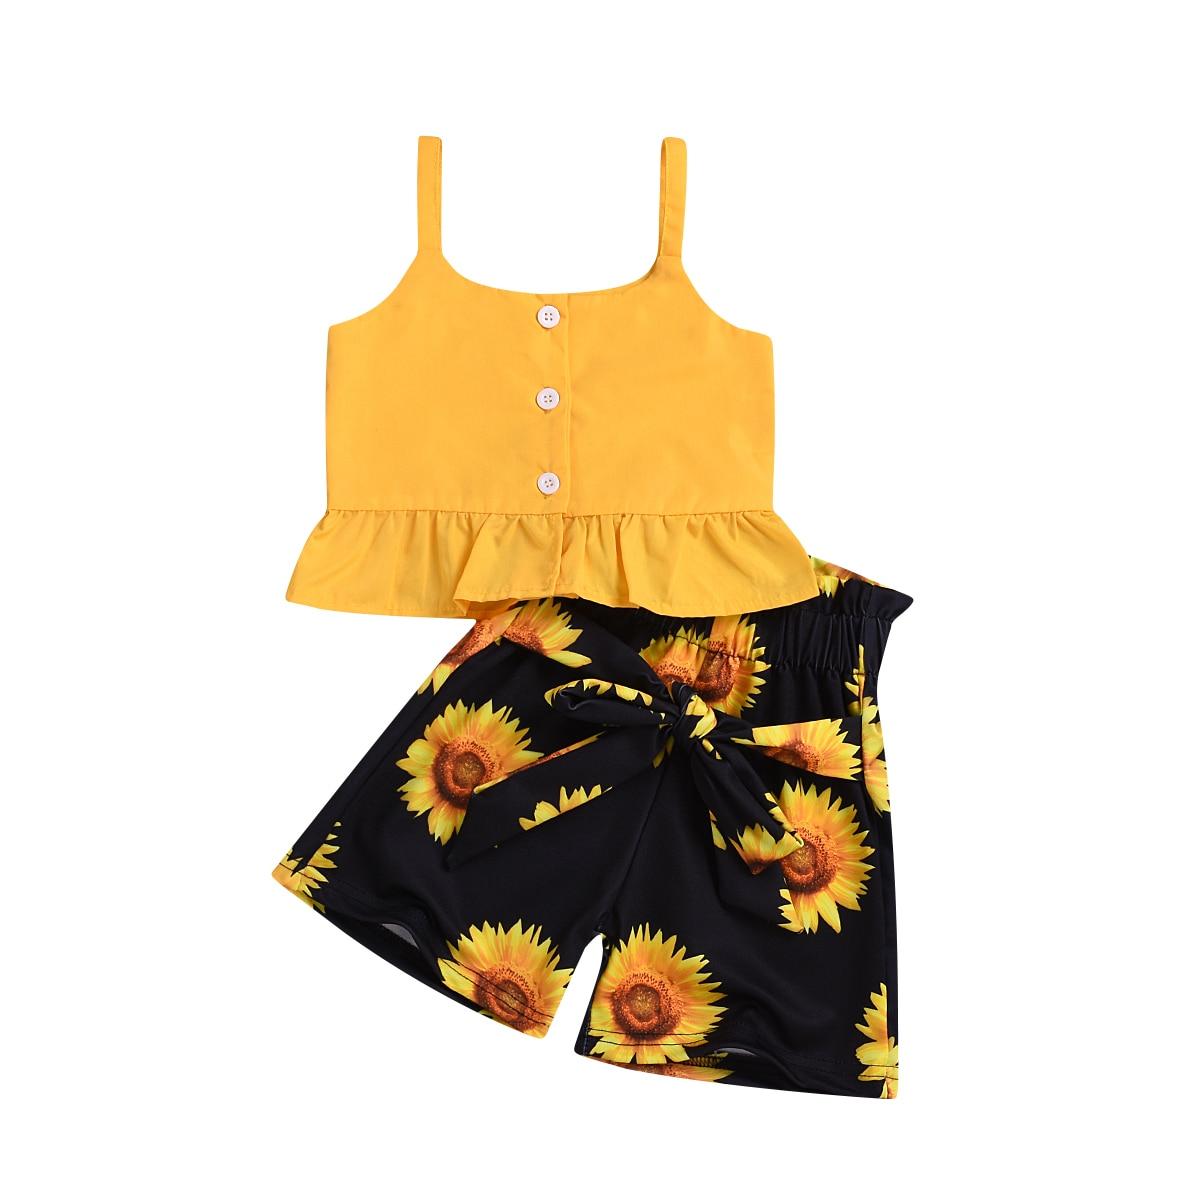 008f19d42a Toddler Baby Kid Girl Holiday Clothes Sets Yellow Sleeveless Tops T-shirt  Tank Floral Shorts